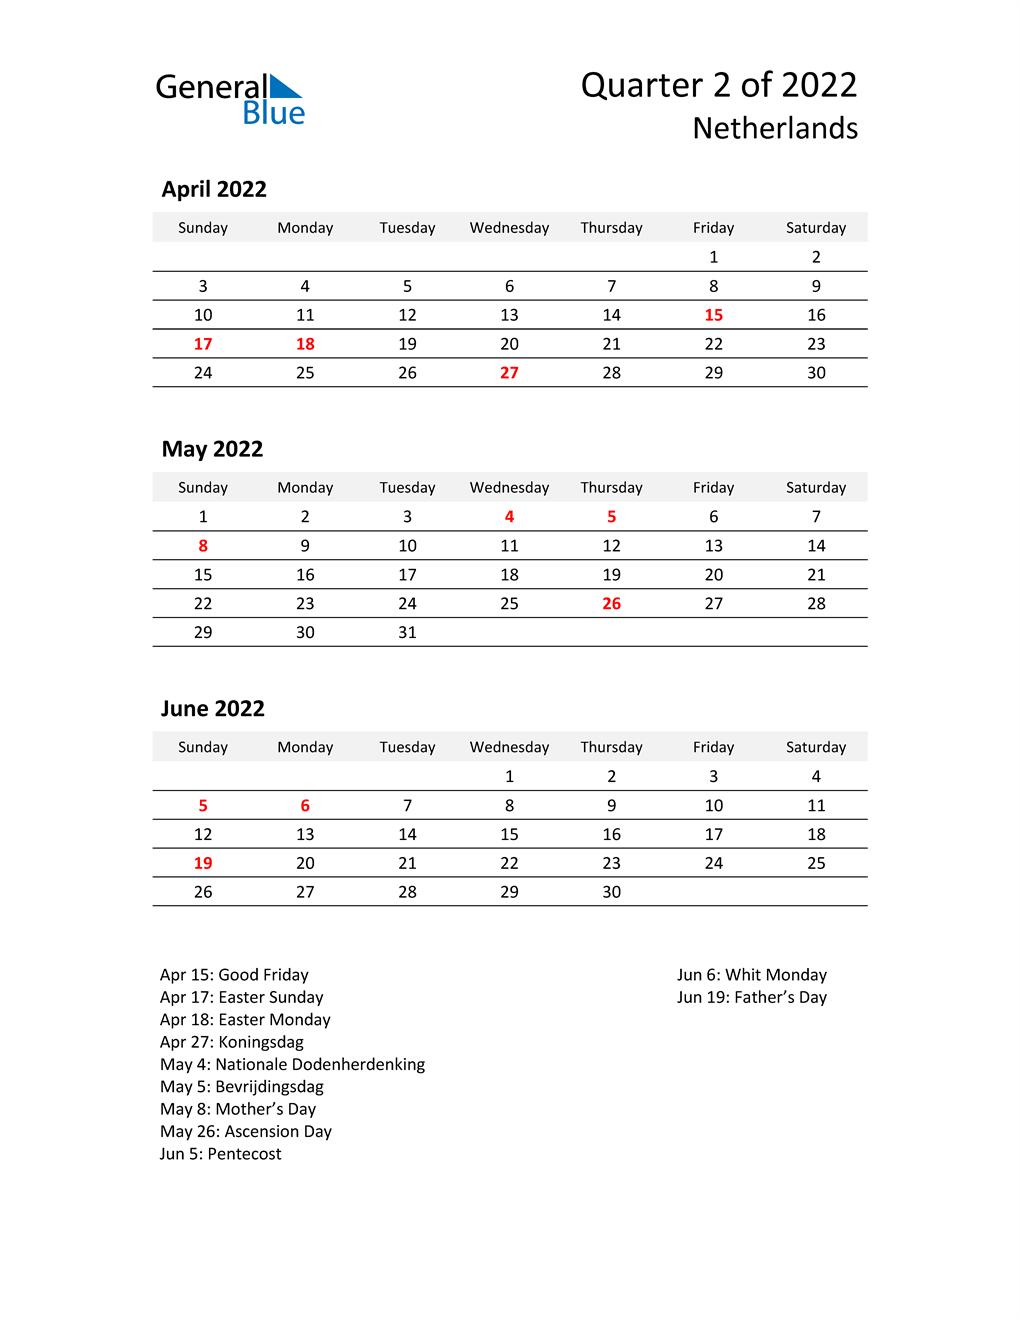 2022 Three-Month Calendar for Netherlands